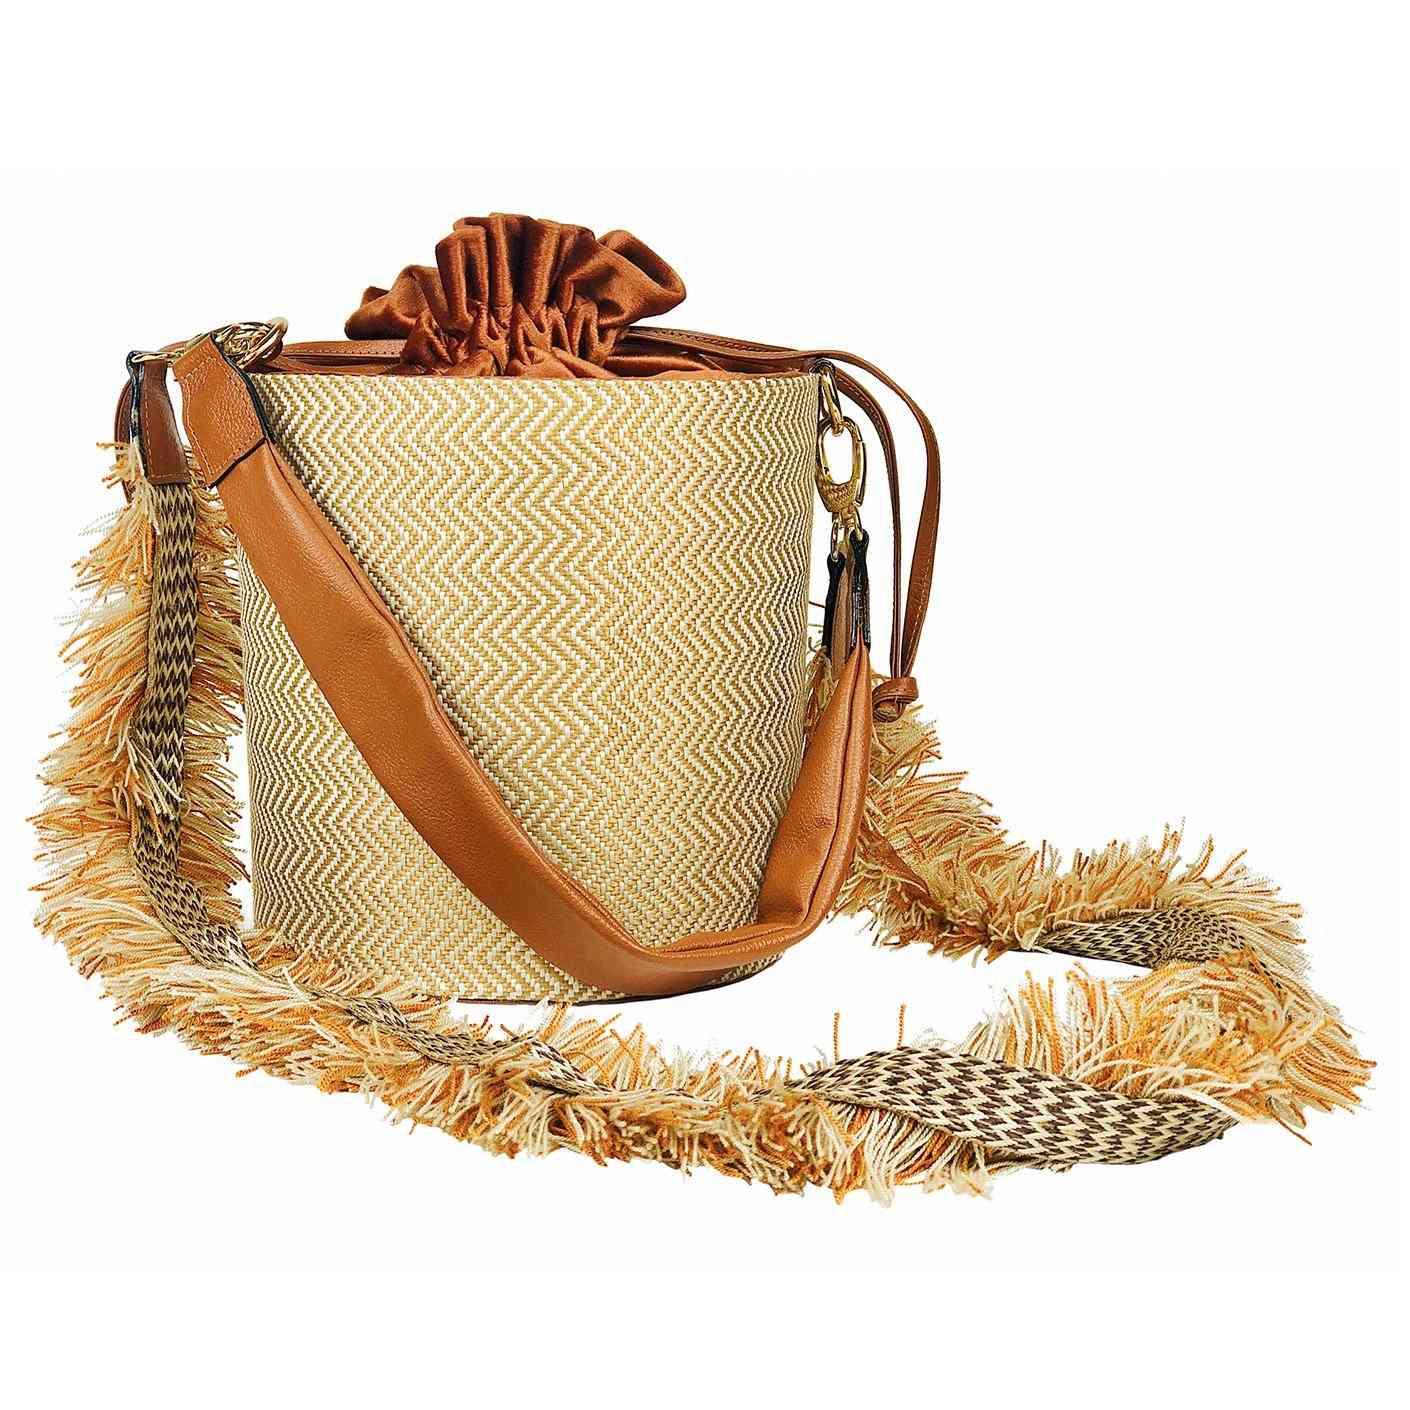 Textile And Leather Handle Handbag